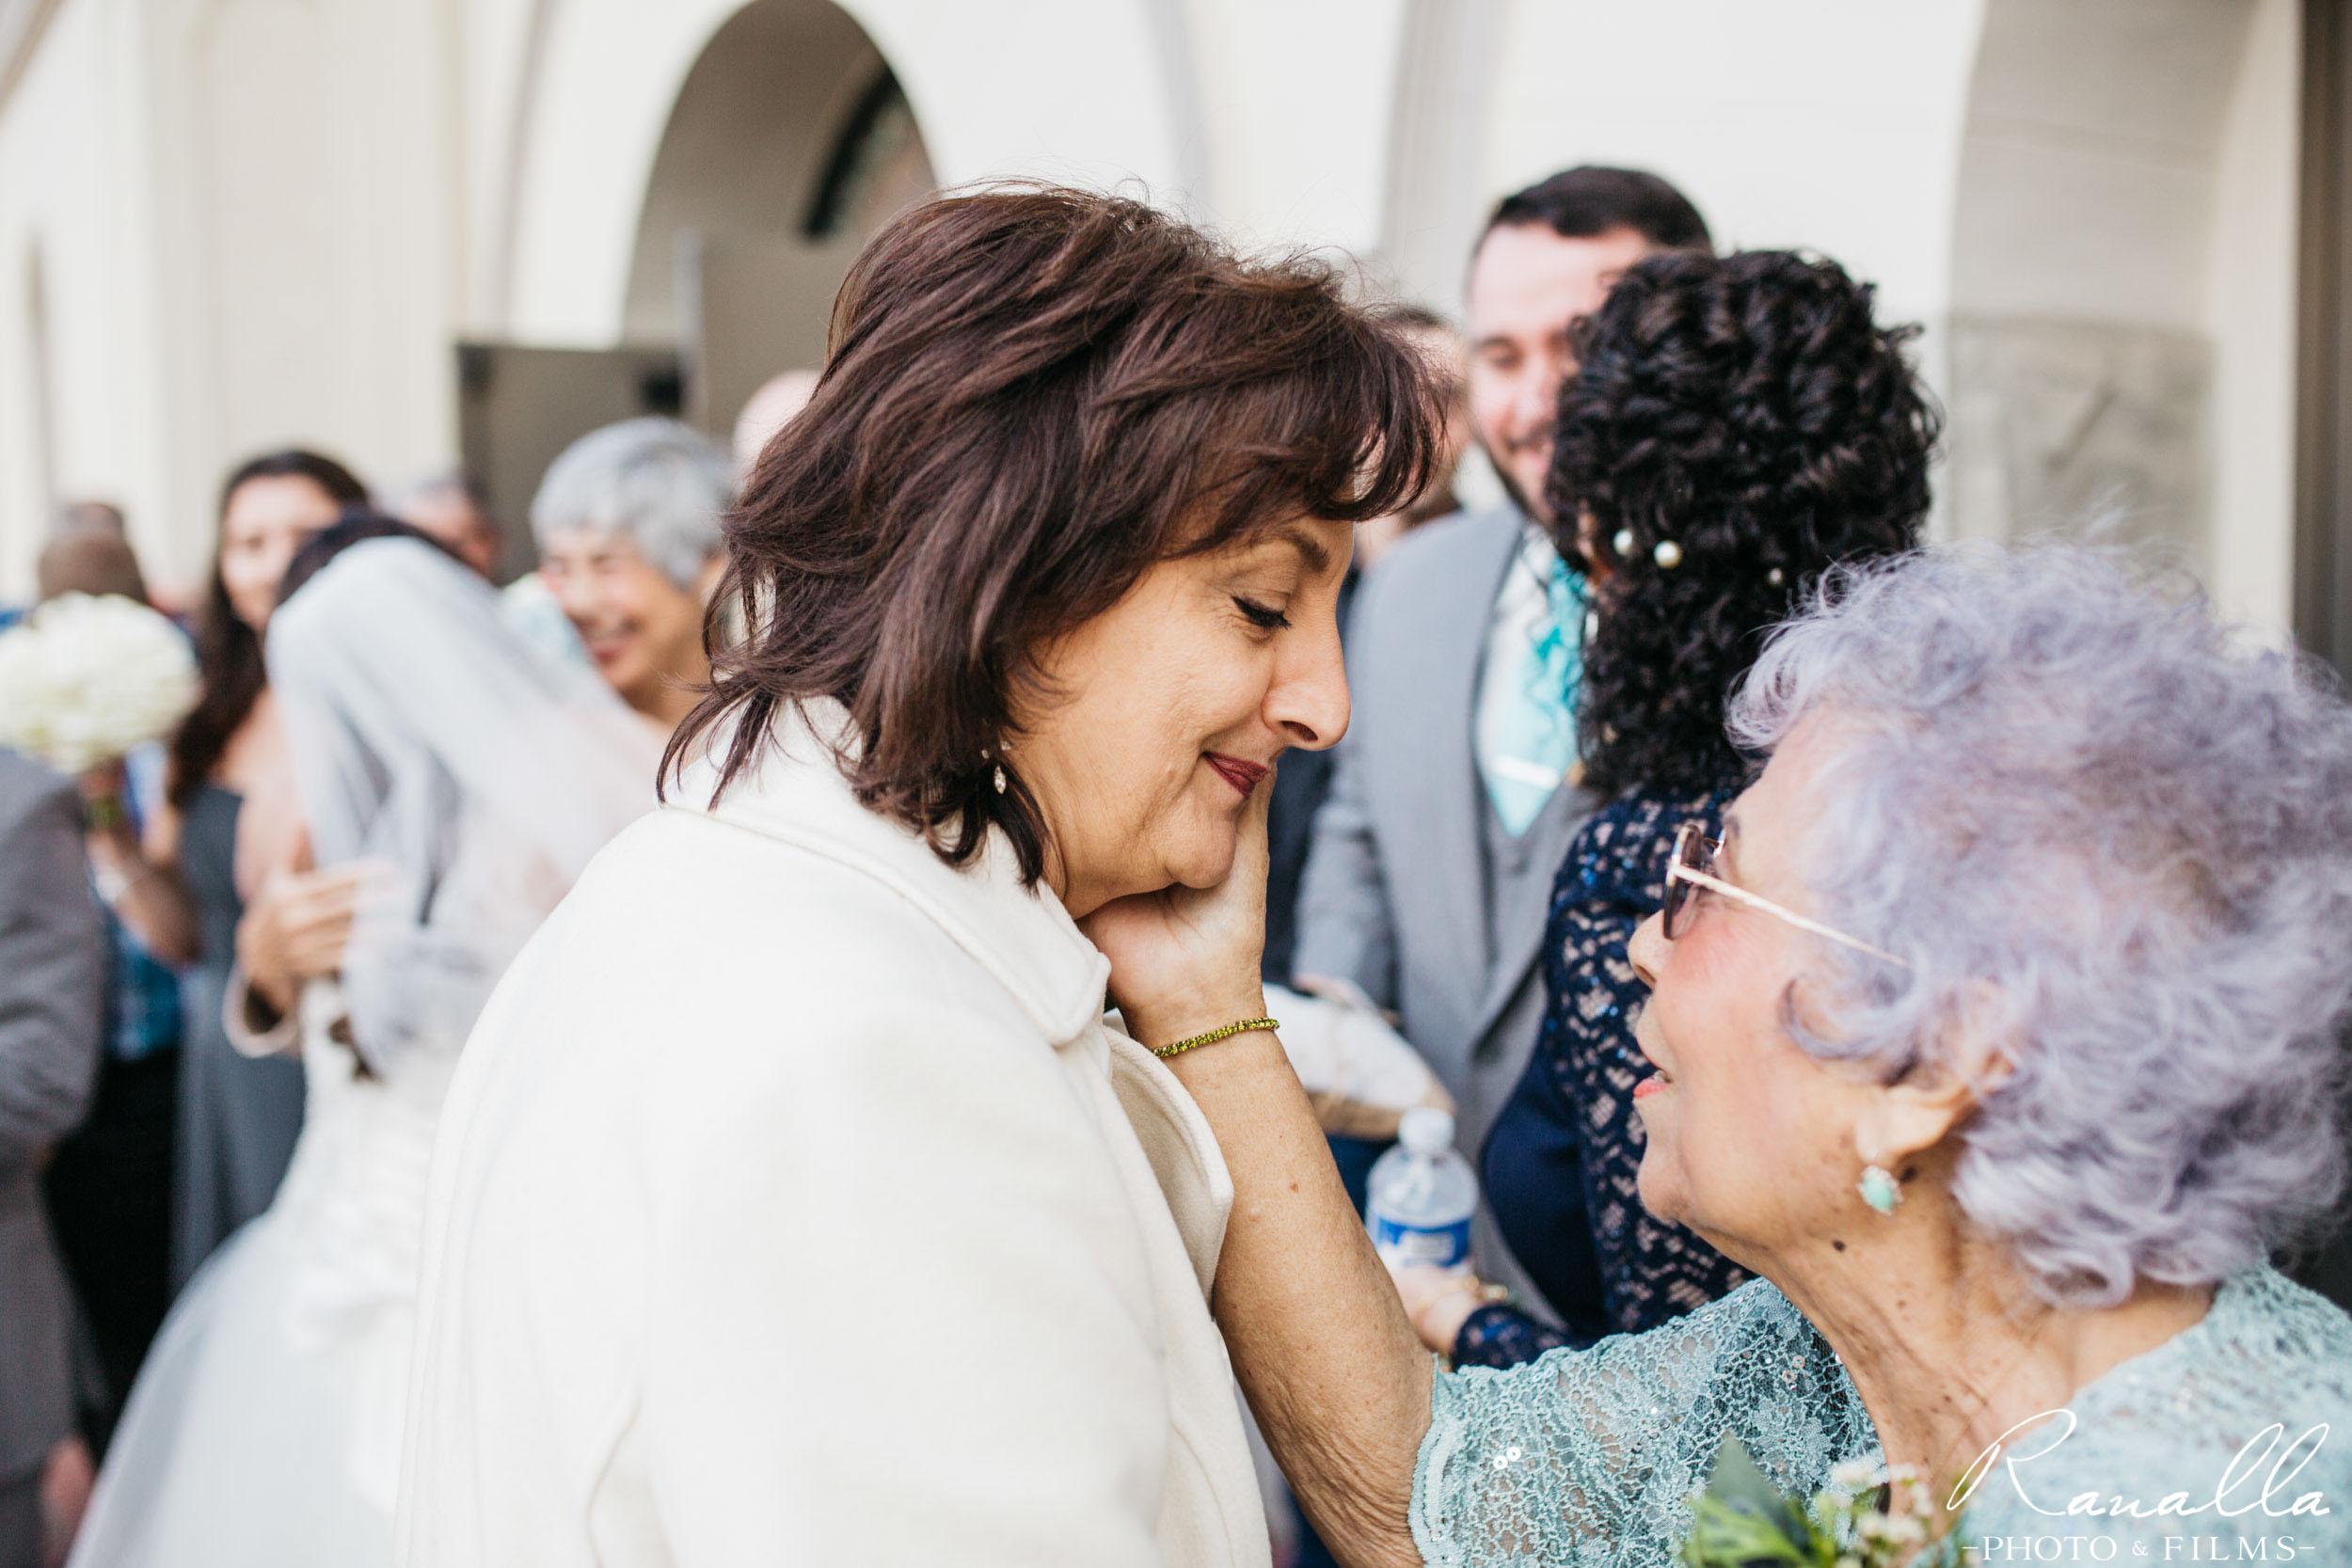 Chico Wedding Photography- Patrick Ranch Wedding Photos- Ranalla Photo & Films